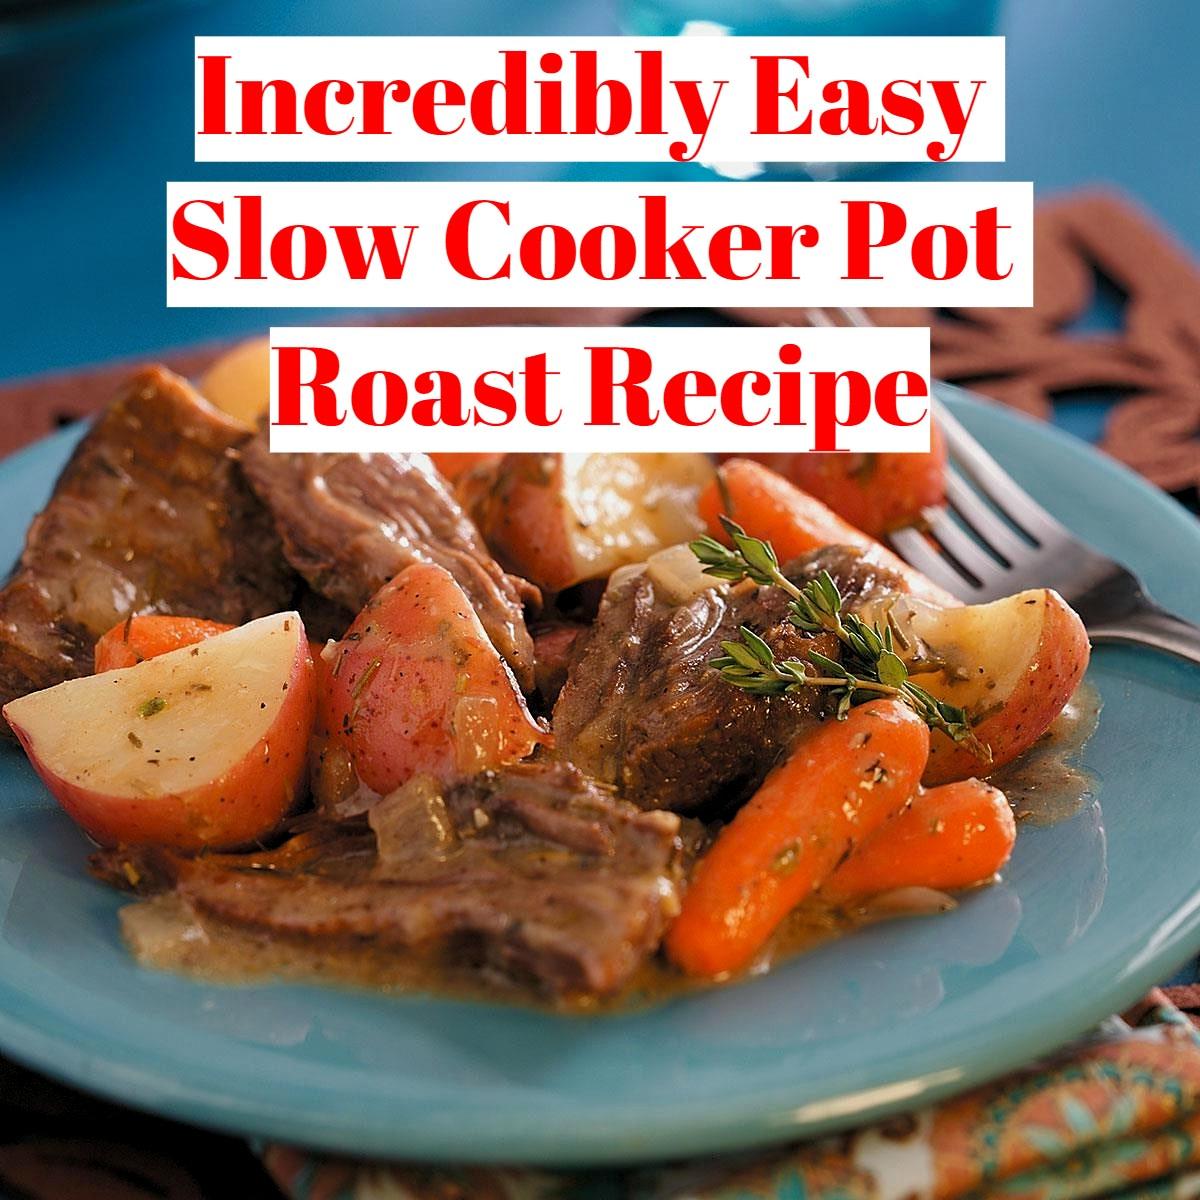 Easy slow cooker pot roast recipe.